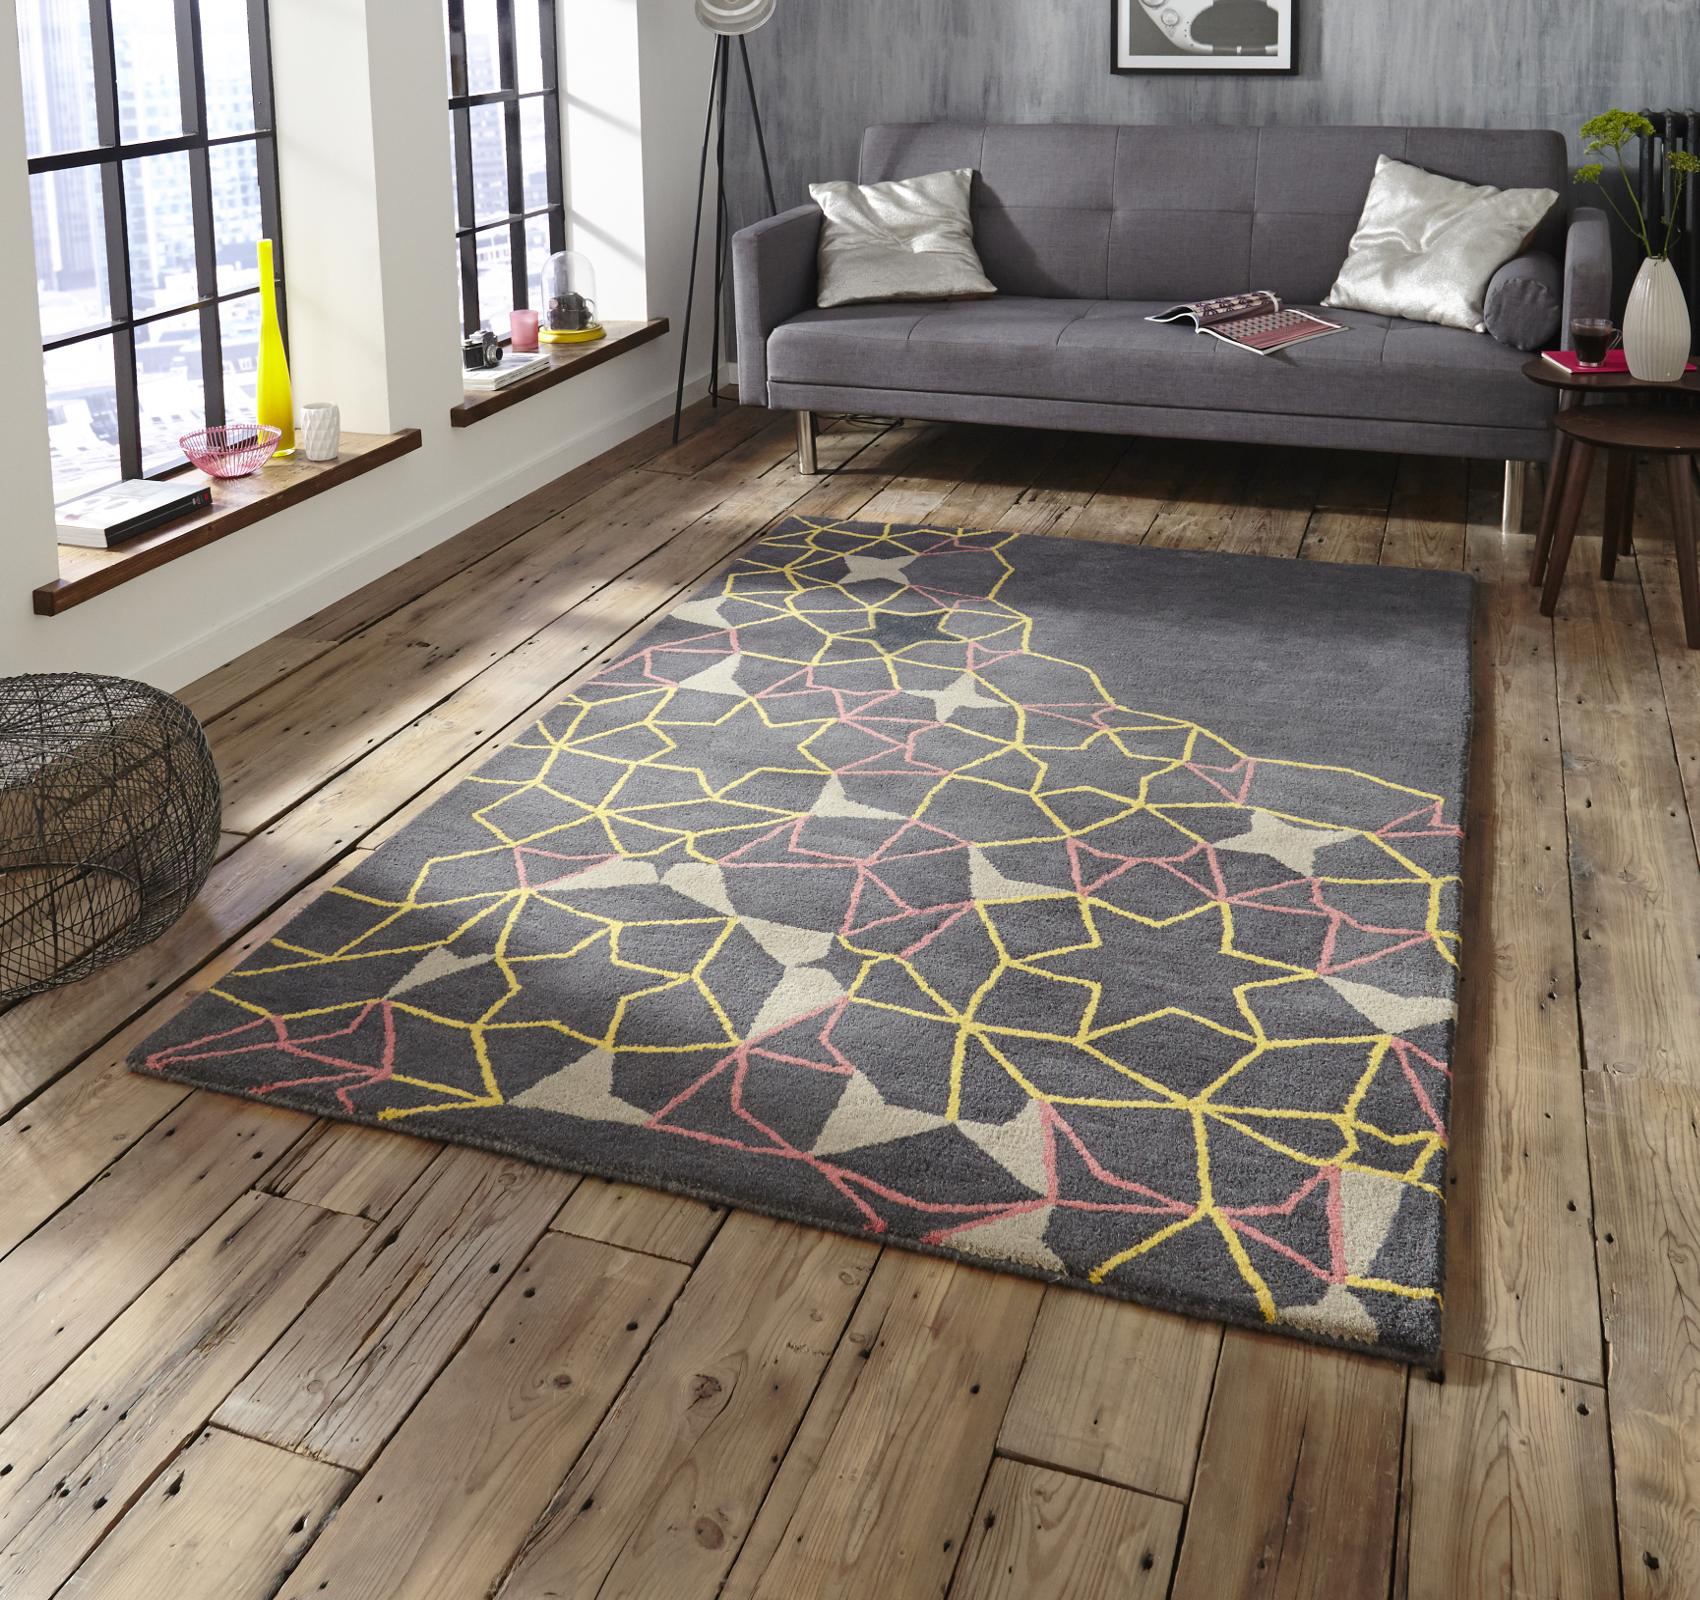 geometric arrows amp stars  wool rug modern hand tufted mat  - geometricarrowsampstarswoolrugmodern